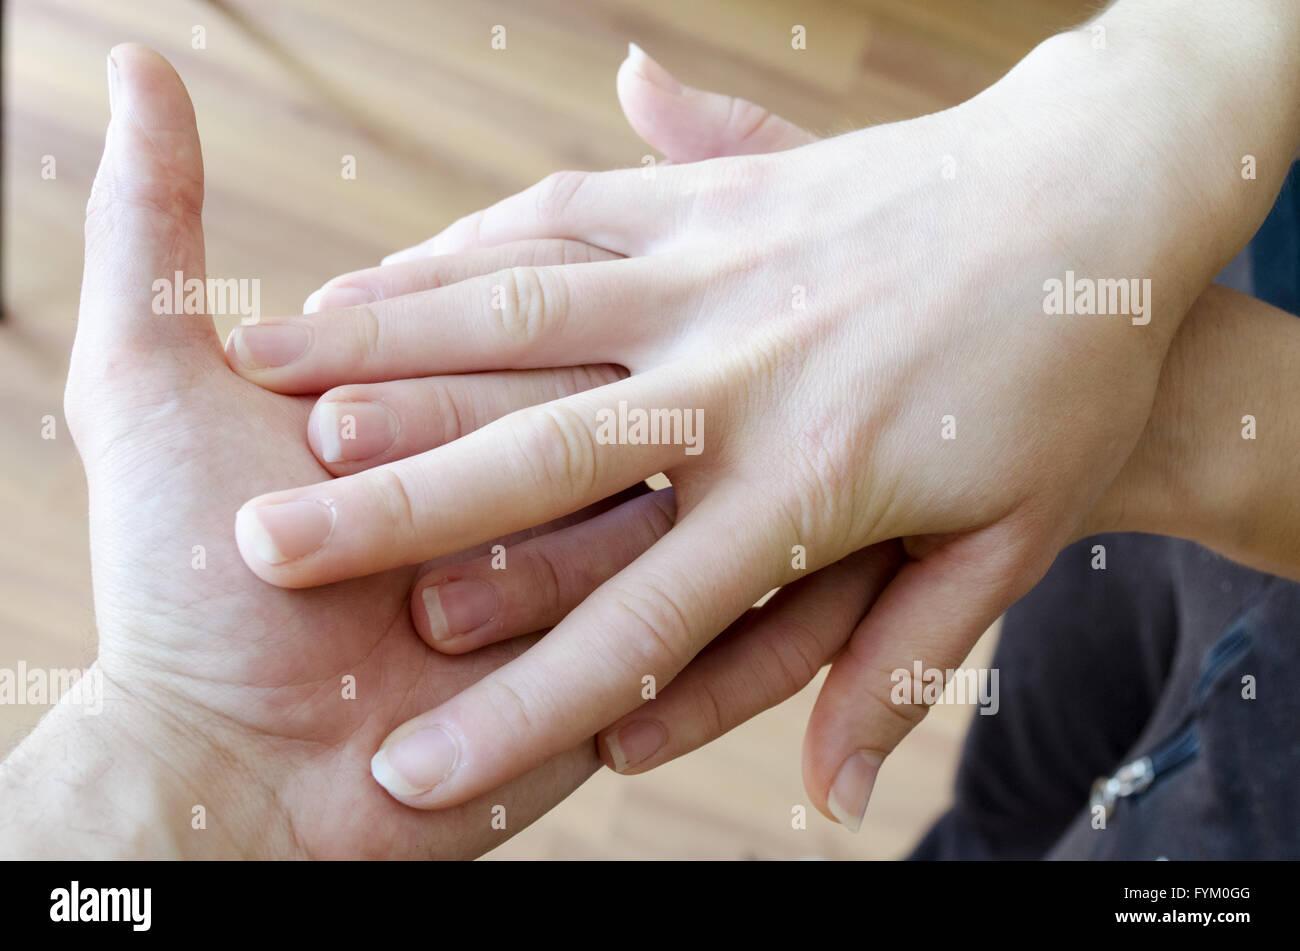 Friendly Handshake. Man And Woman Shaking Hands. - Stock Image